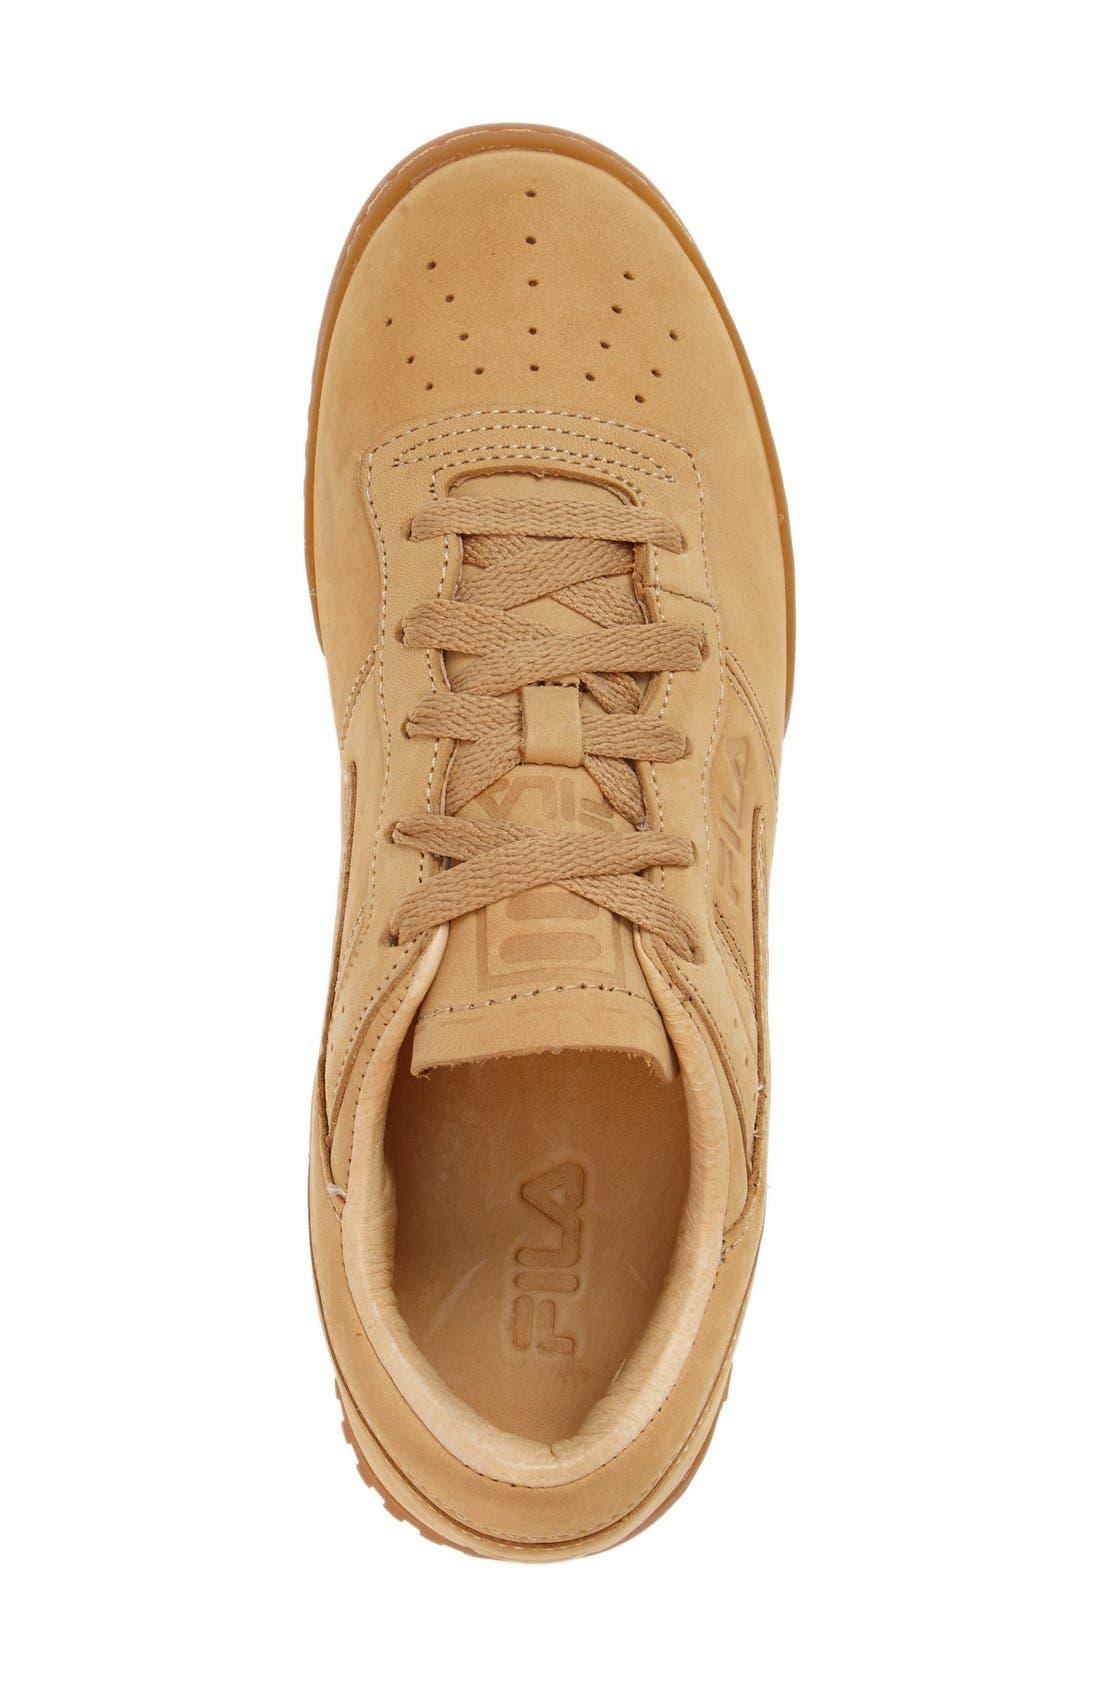 USA Heritage Sneaker,                             Alternate thumbnail 3, color,                             Tan Nubuck Leather